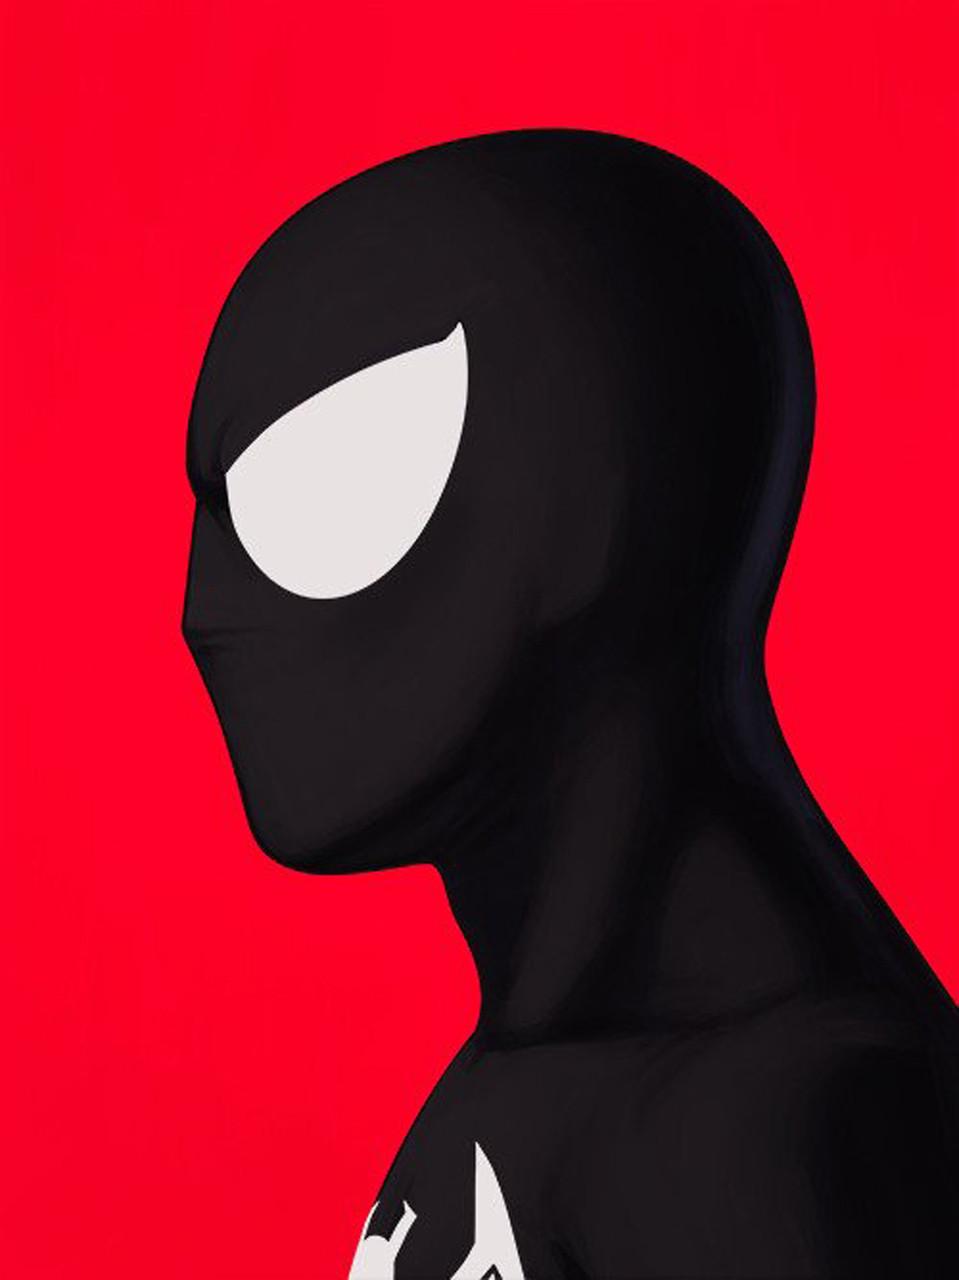 Mondo Black Suit Spider-Man Mike Mitchell Portrait Giclee Proof